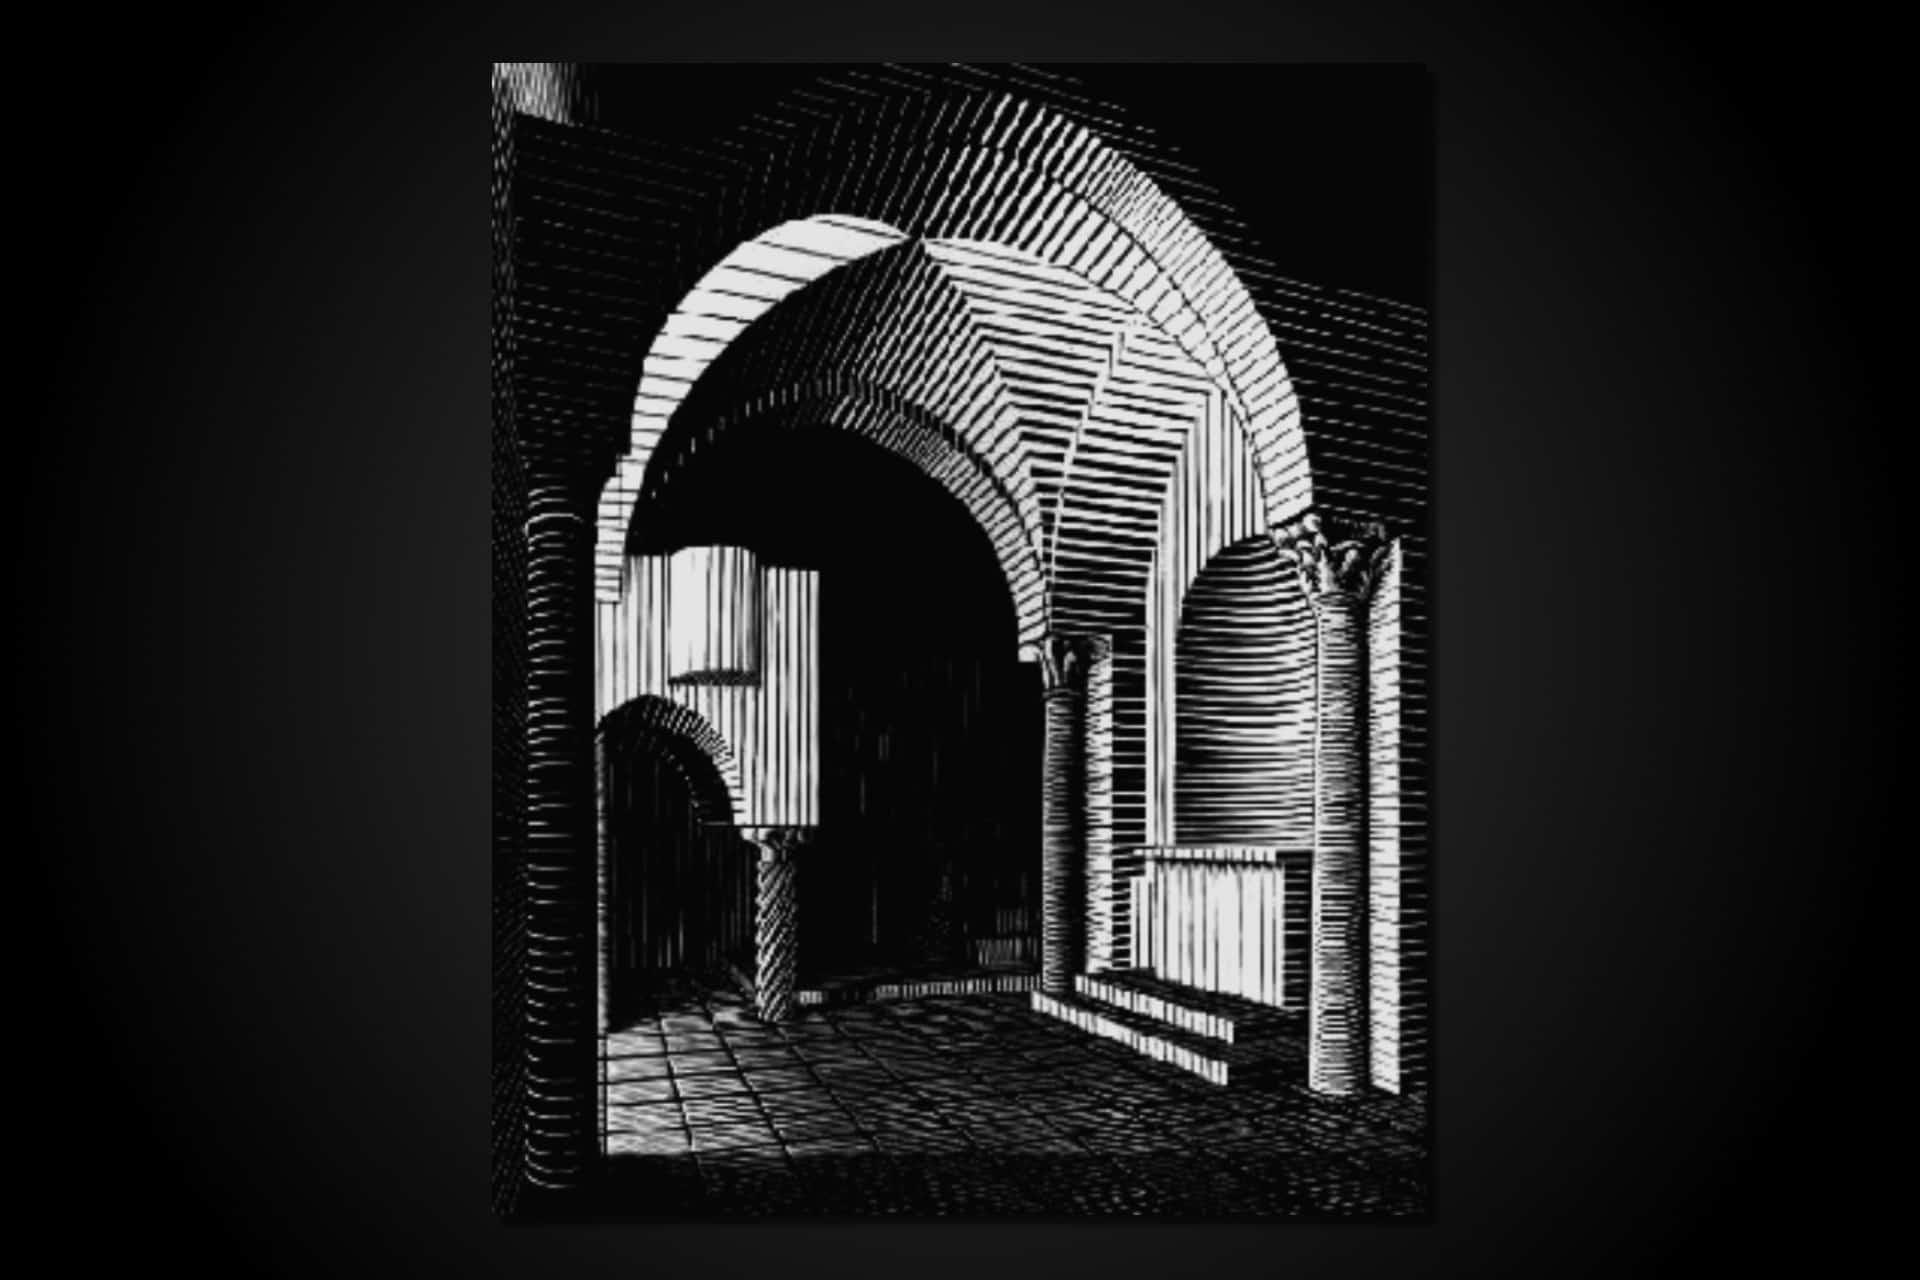 Casa sin fin - Artemisa Téllez